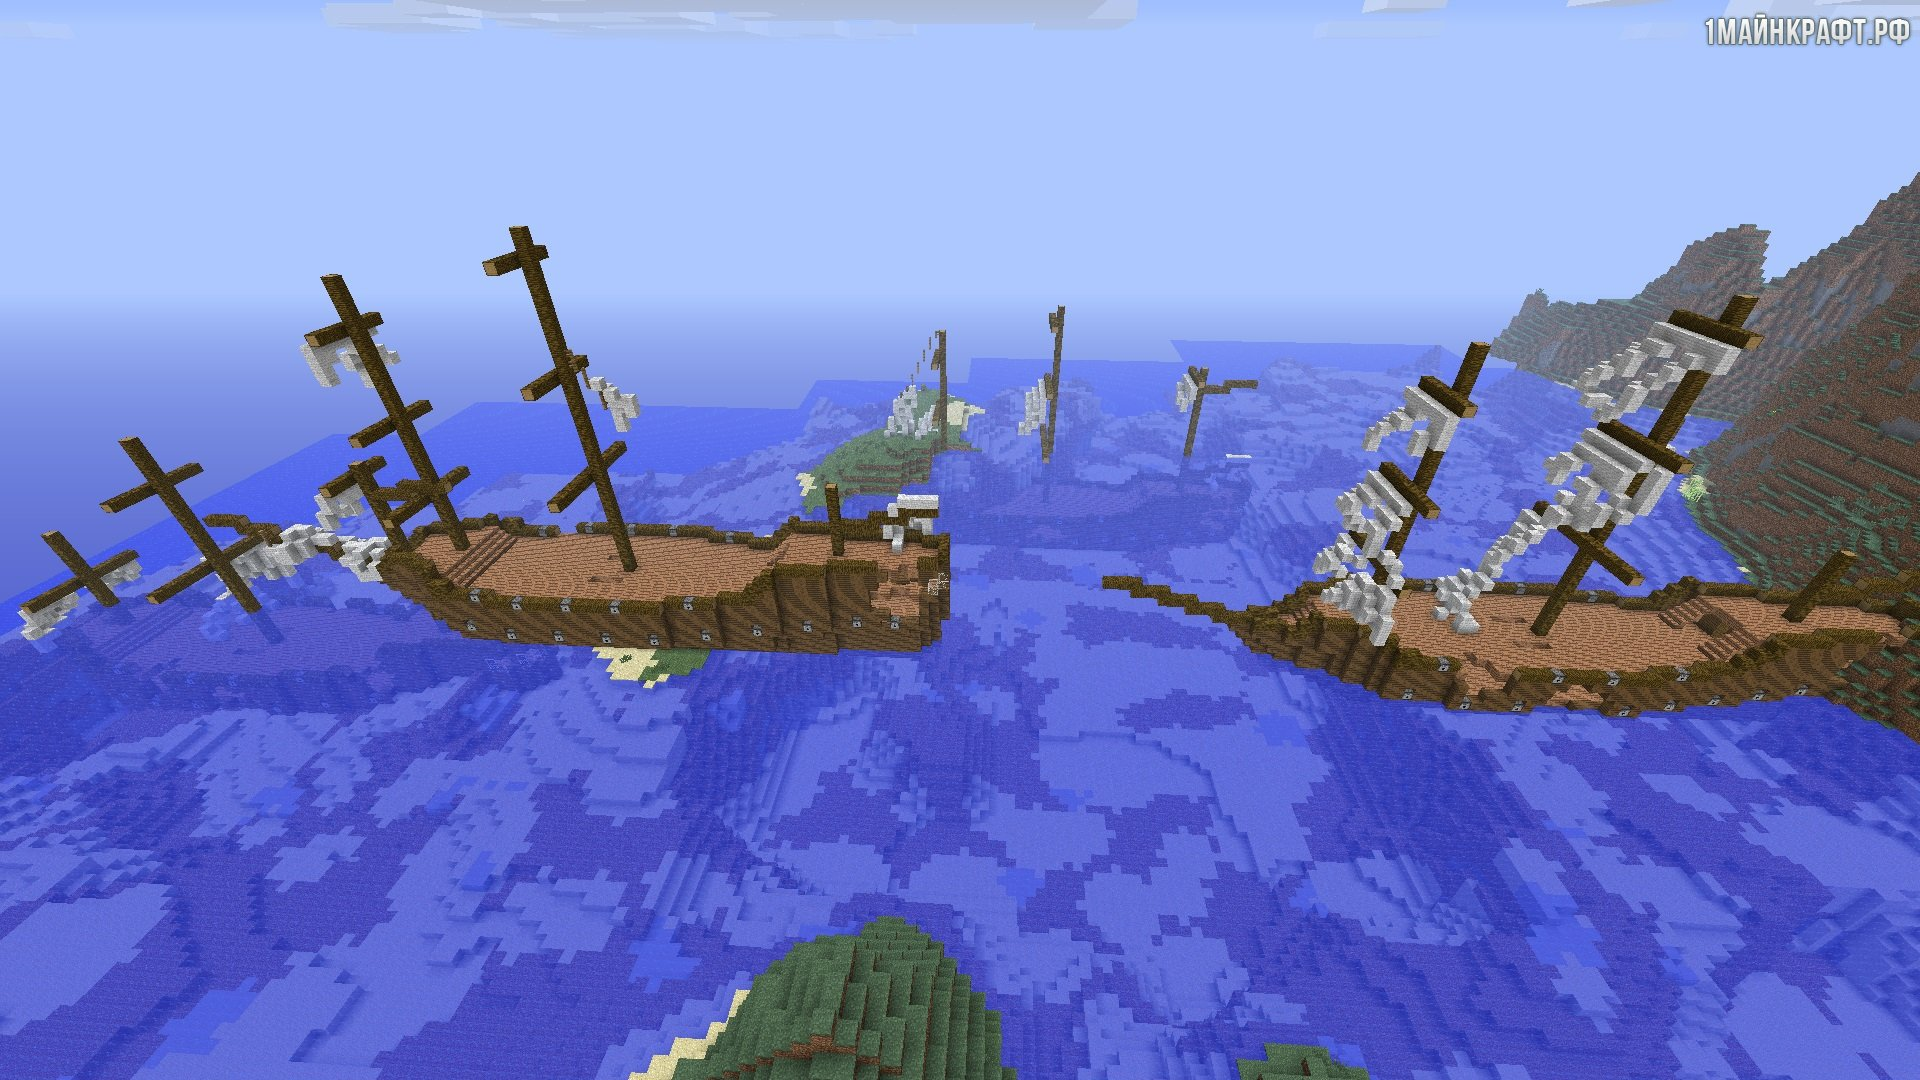 Скачать мод на майнкрафт 1.7.10 на пиратов замки и на большие корабли